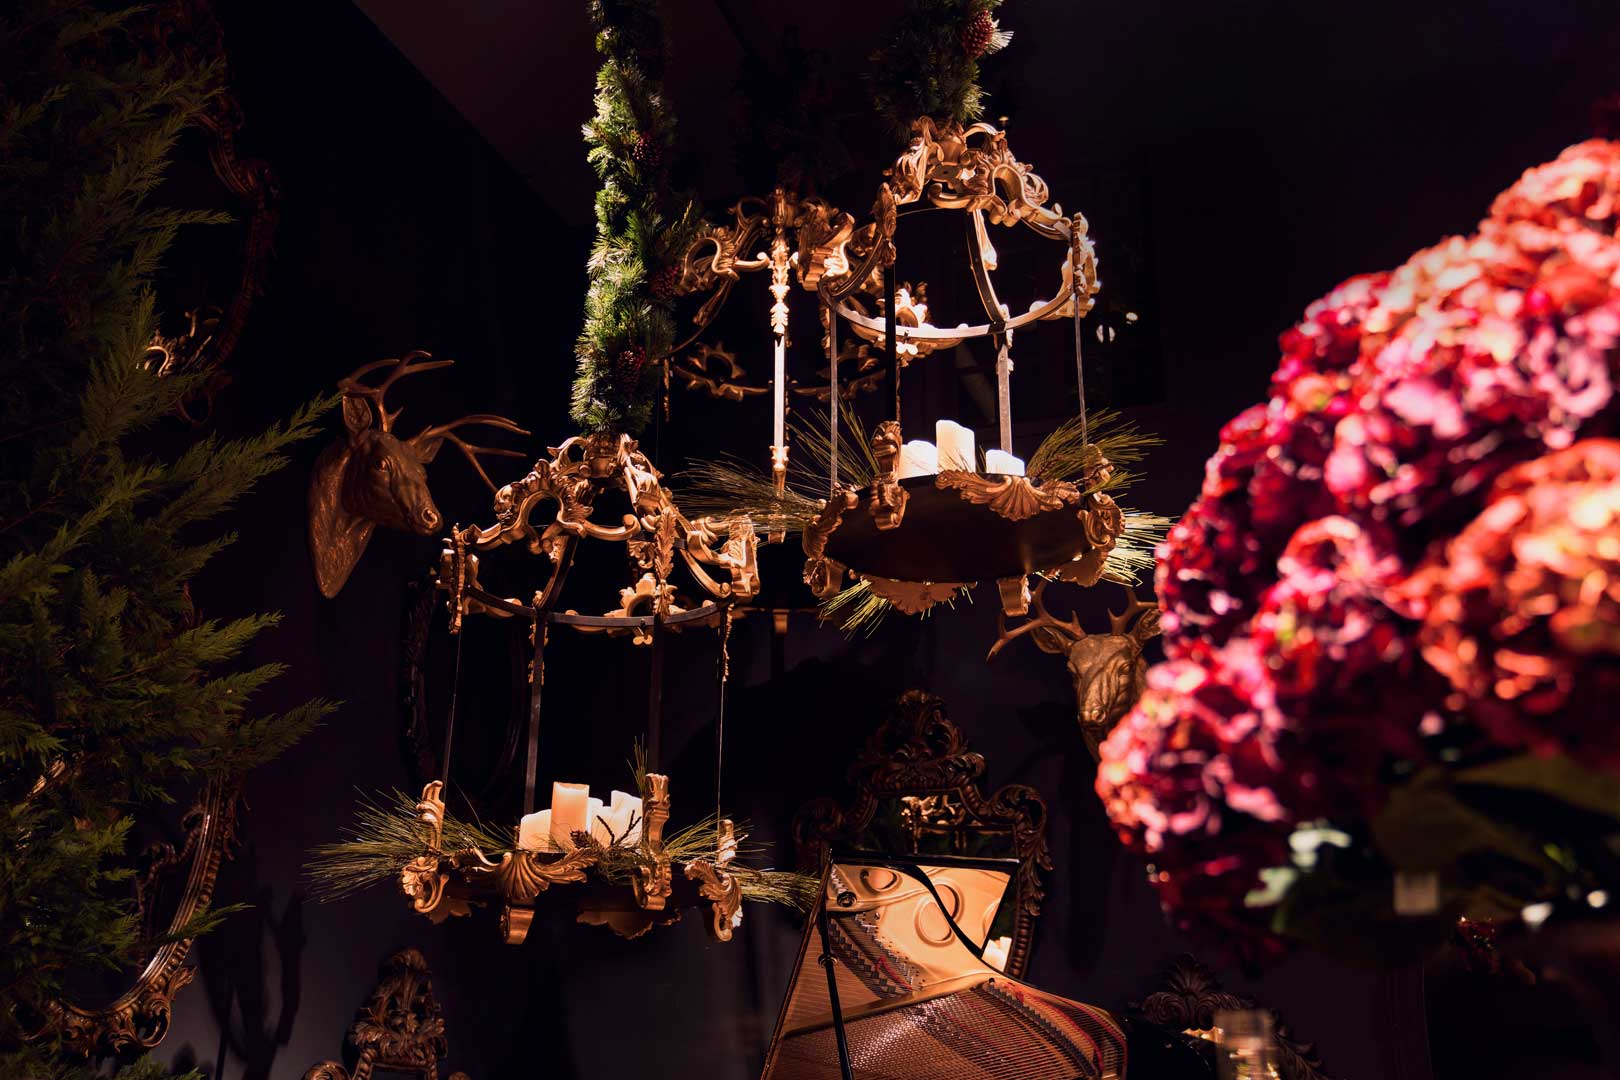 Candele Da Giardino Milano : Lanterne portacandele fai da te idee facili